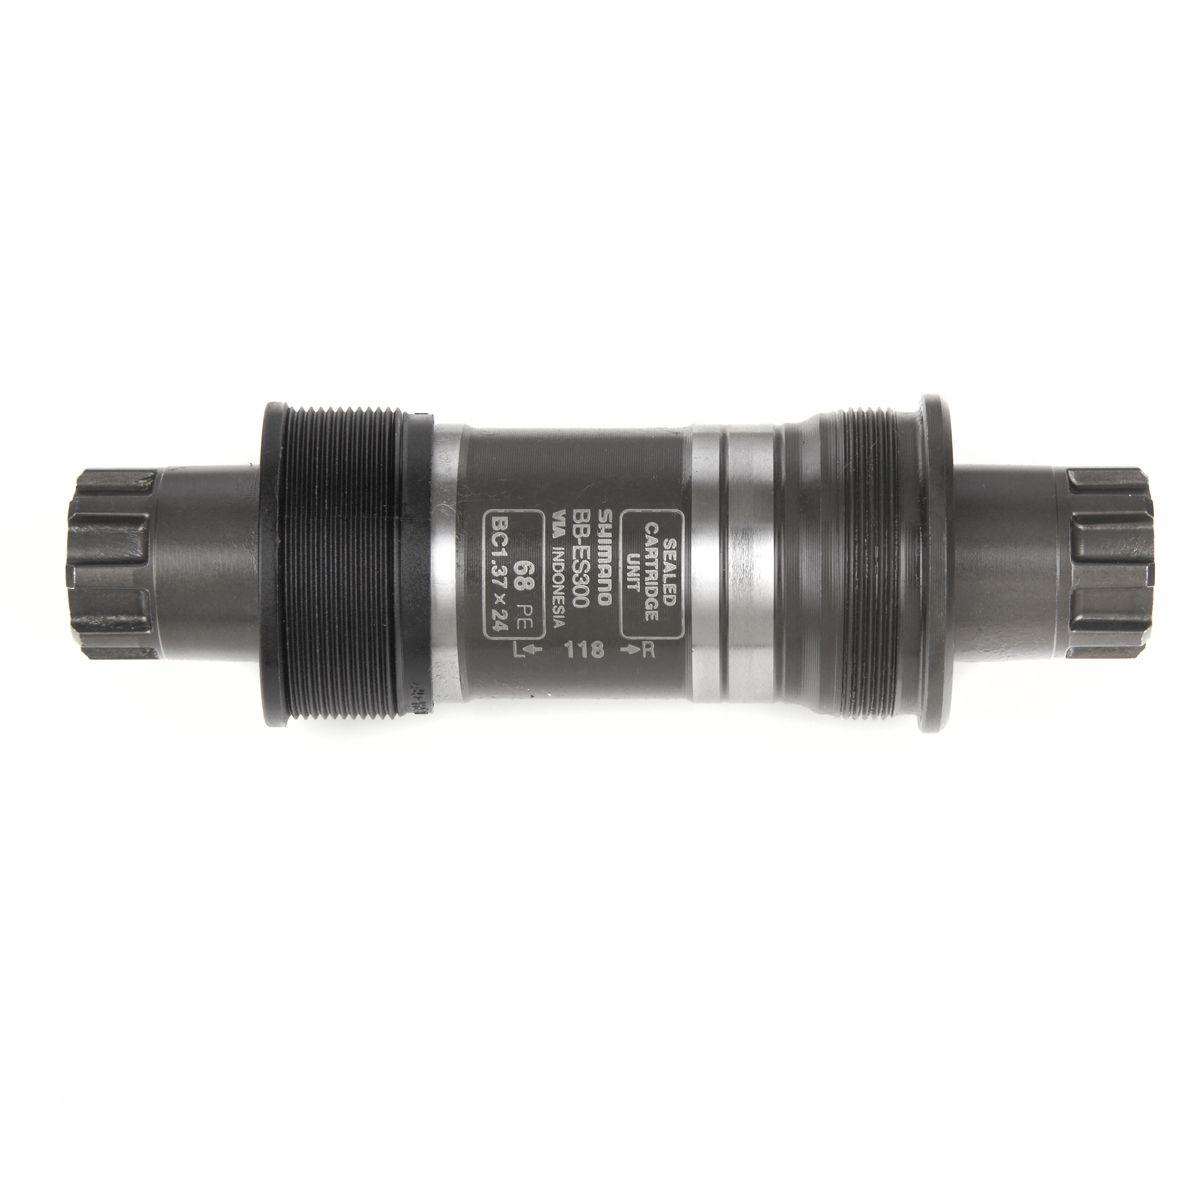 Boîtier de pédalier Shimano BB-ES300 Octalink BSA 68 x 118 mm